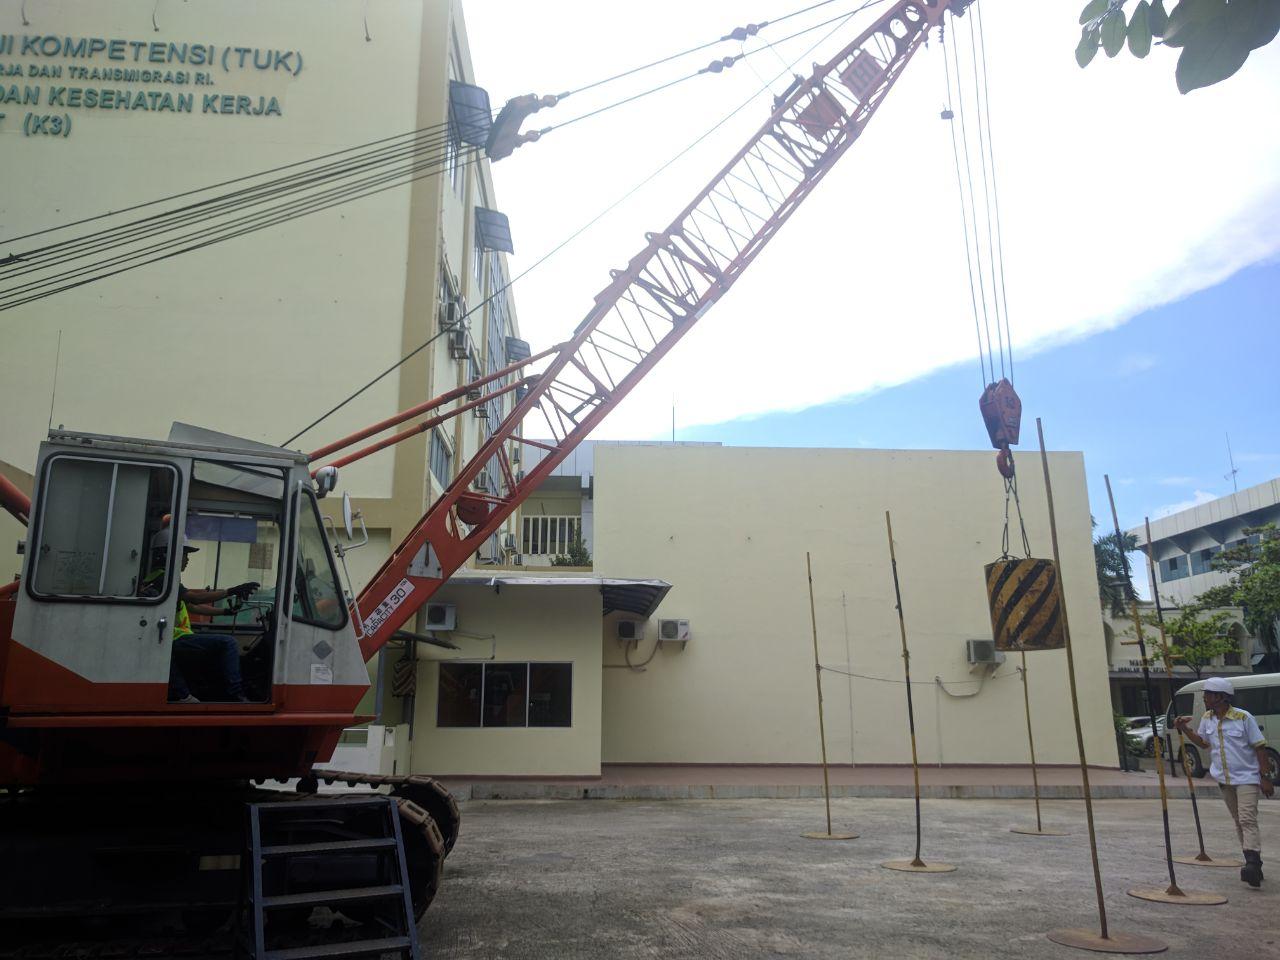 Pelatihan Operator Crane Kelas 2 dan 3 Publik, 06 s.d 09 Maret 2018